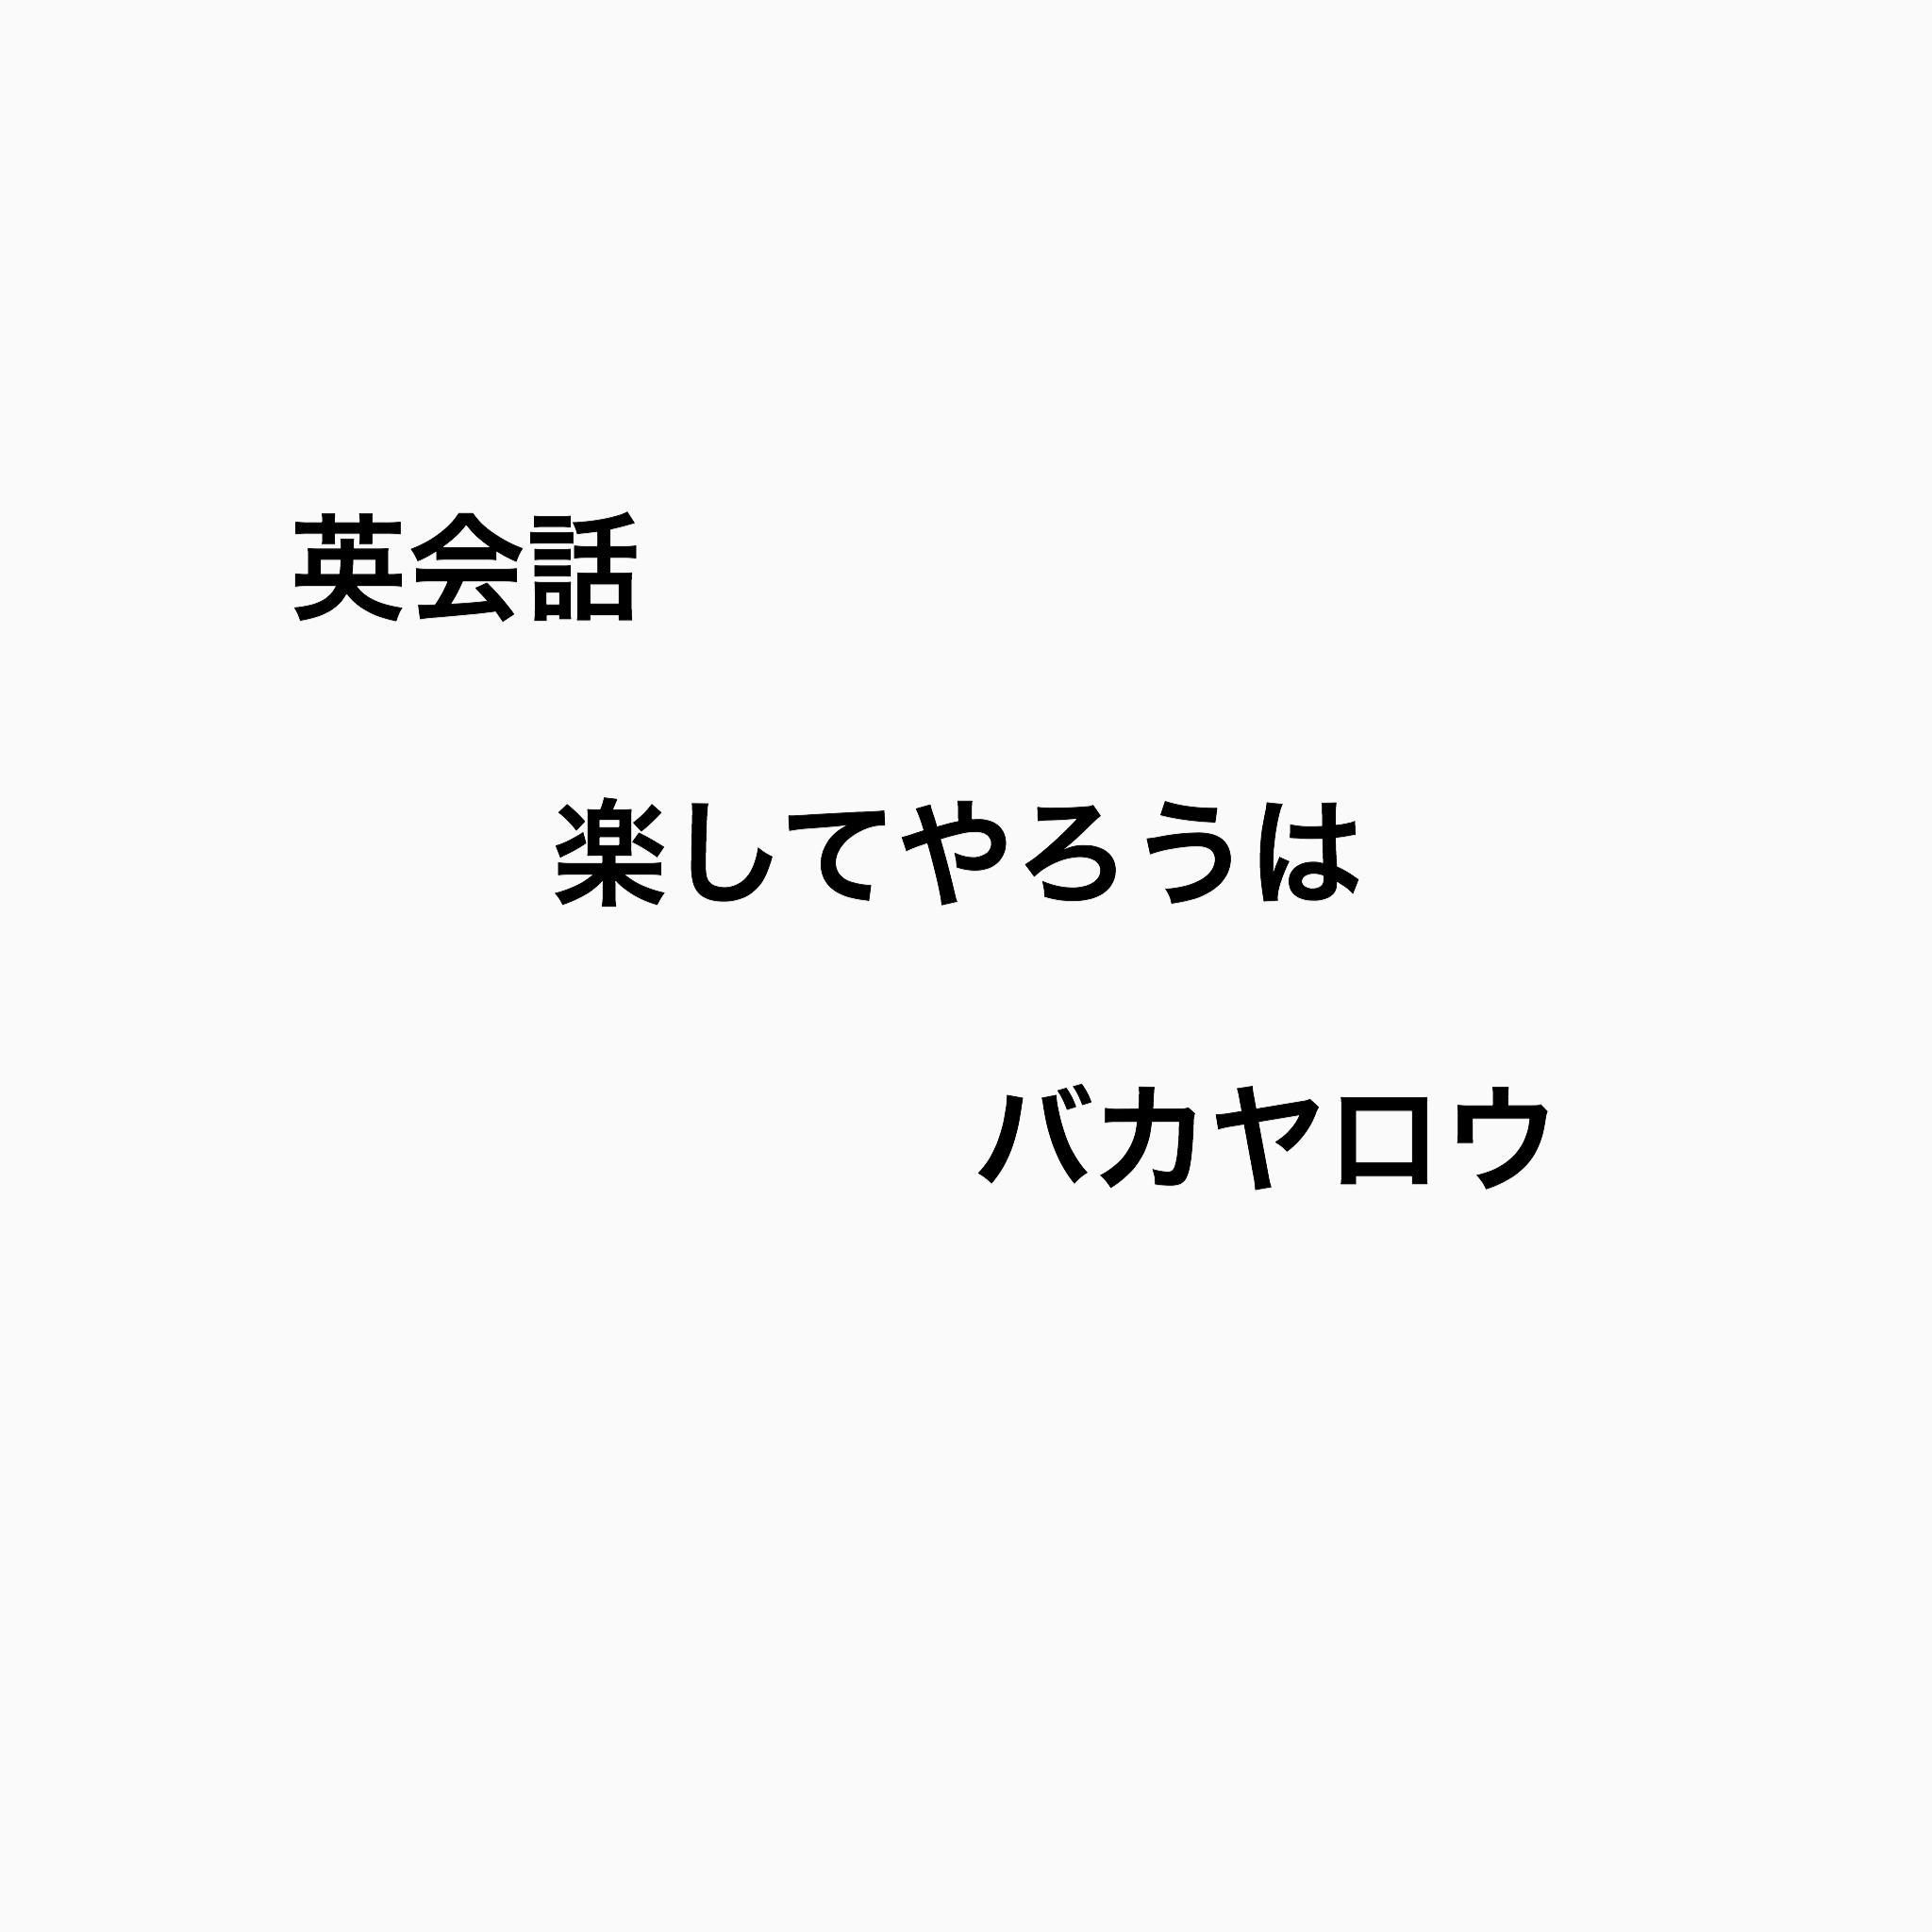 201703262020445a6.jpg